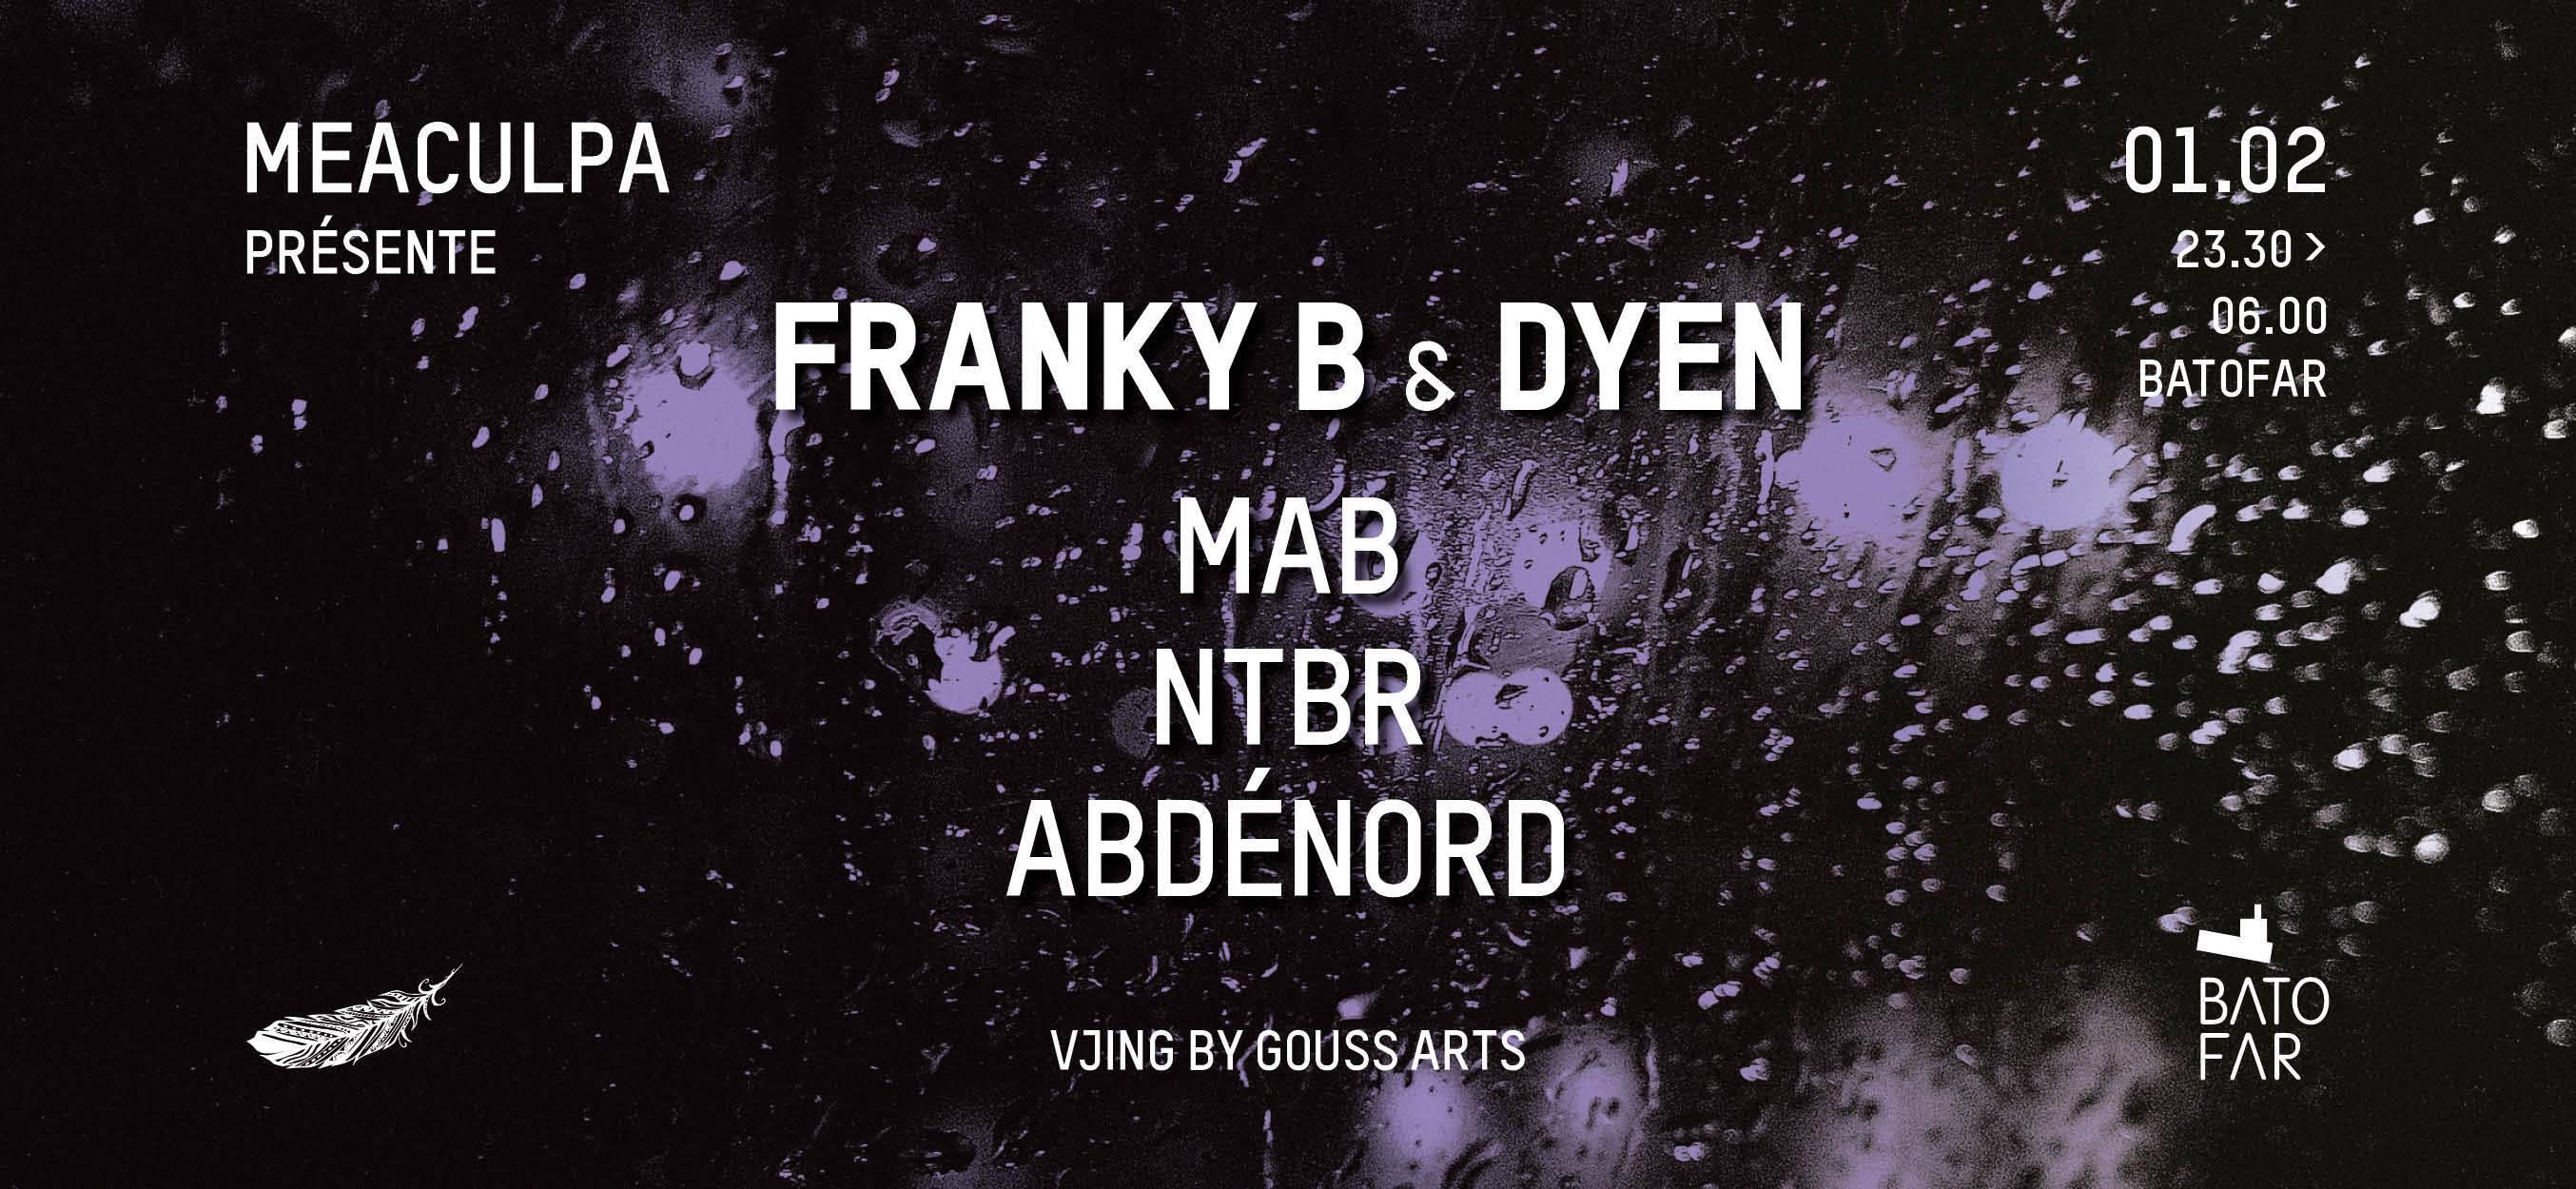 Meaculpa invite : Franky B & Dyen / Mab / NTBR / Abdénord